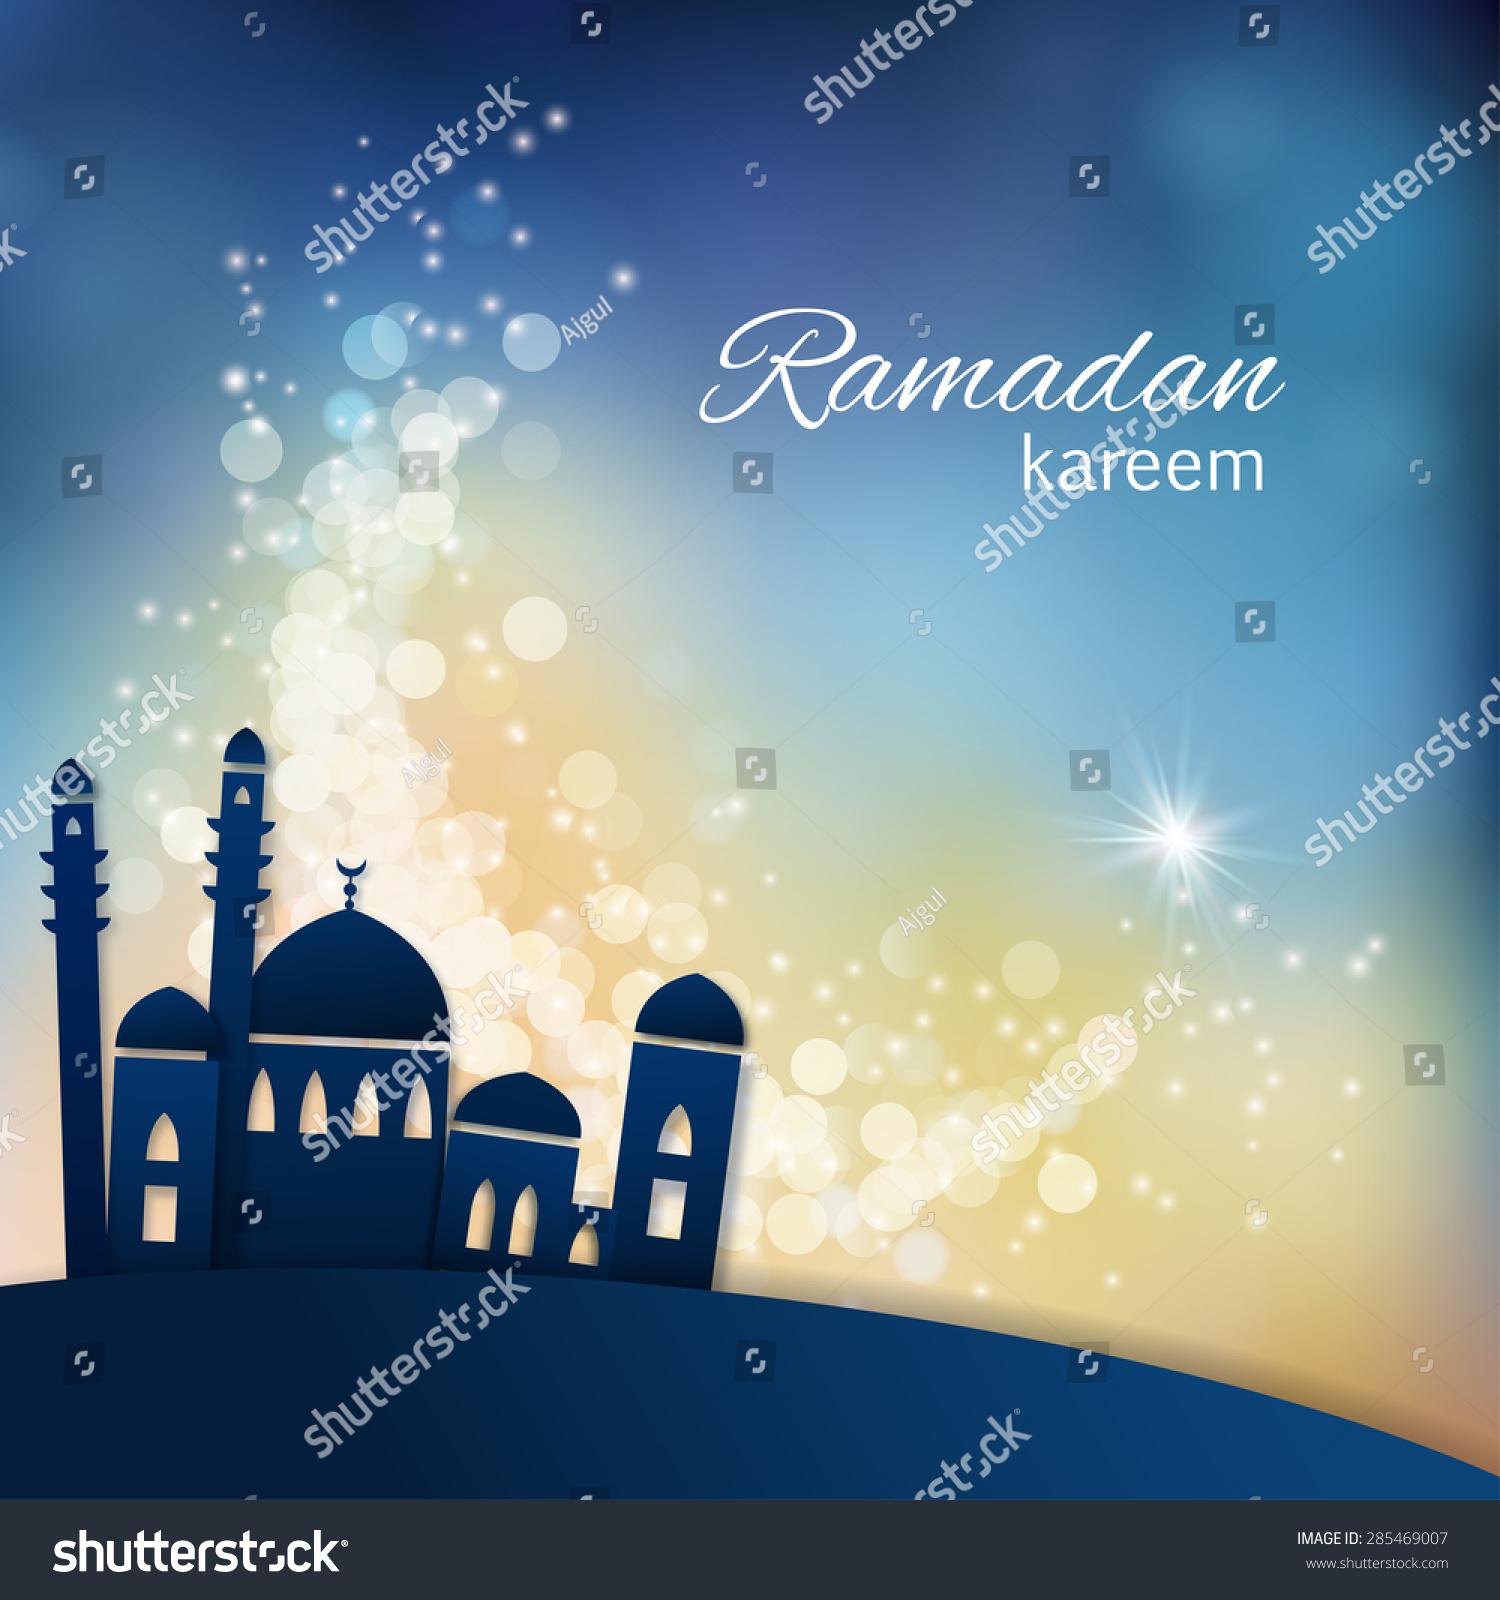 Ramadan greetings background view mosque shiny stock vector ramadan greetings background view of mosque in shiny blue night background vector illustration kristyandbryce Choice Image